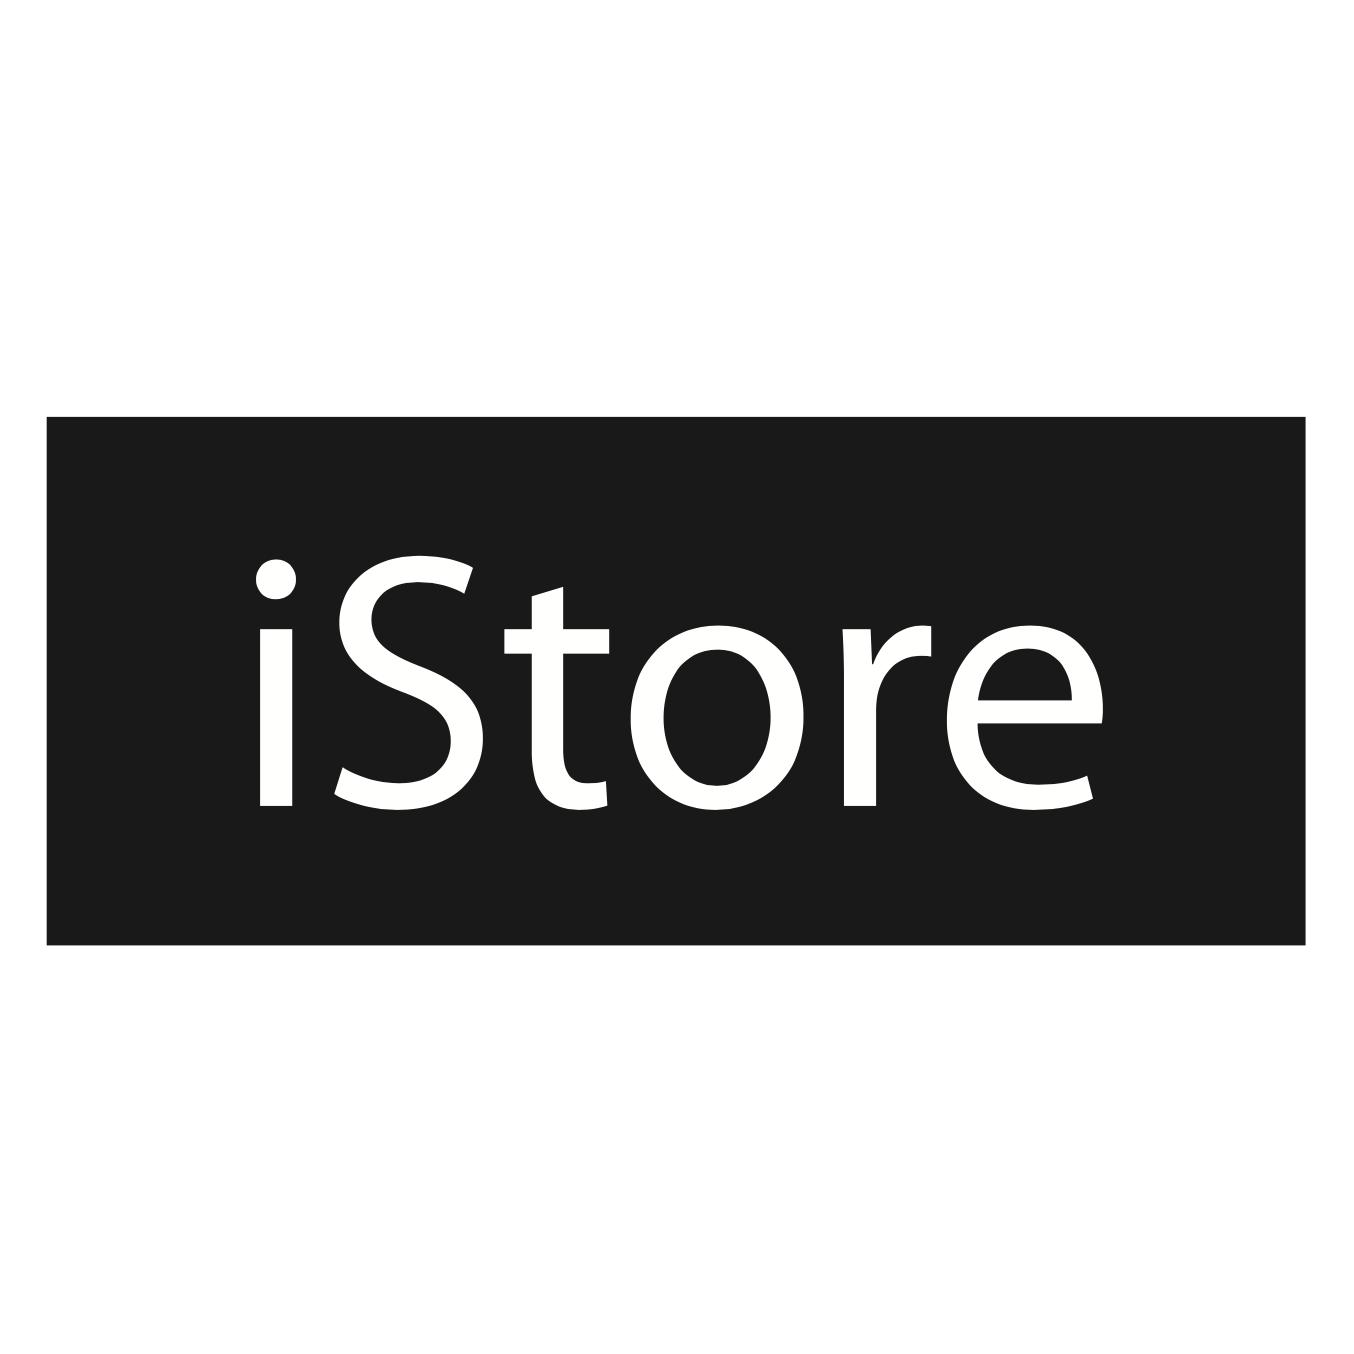 Jack Spade Comold Inlay for iPhone X - Shadow Camo Black Leather